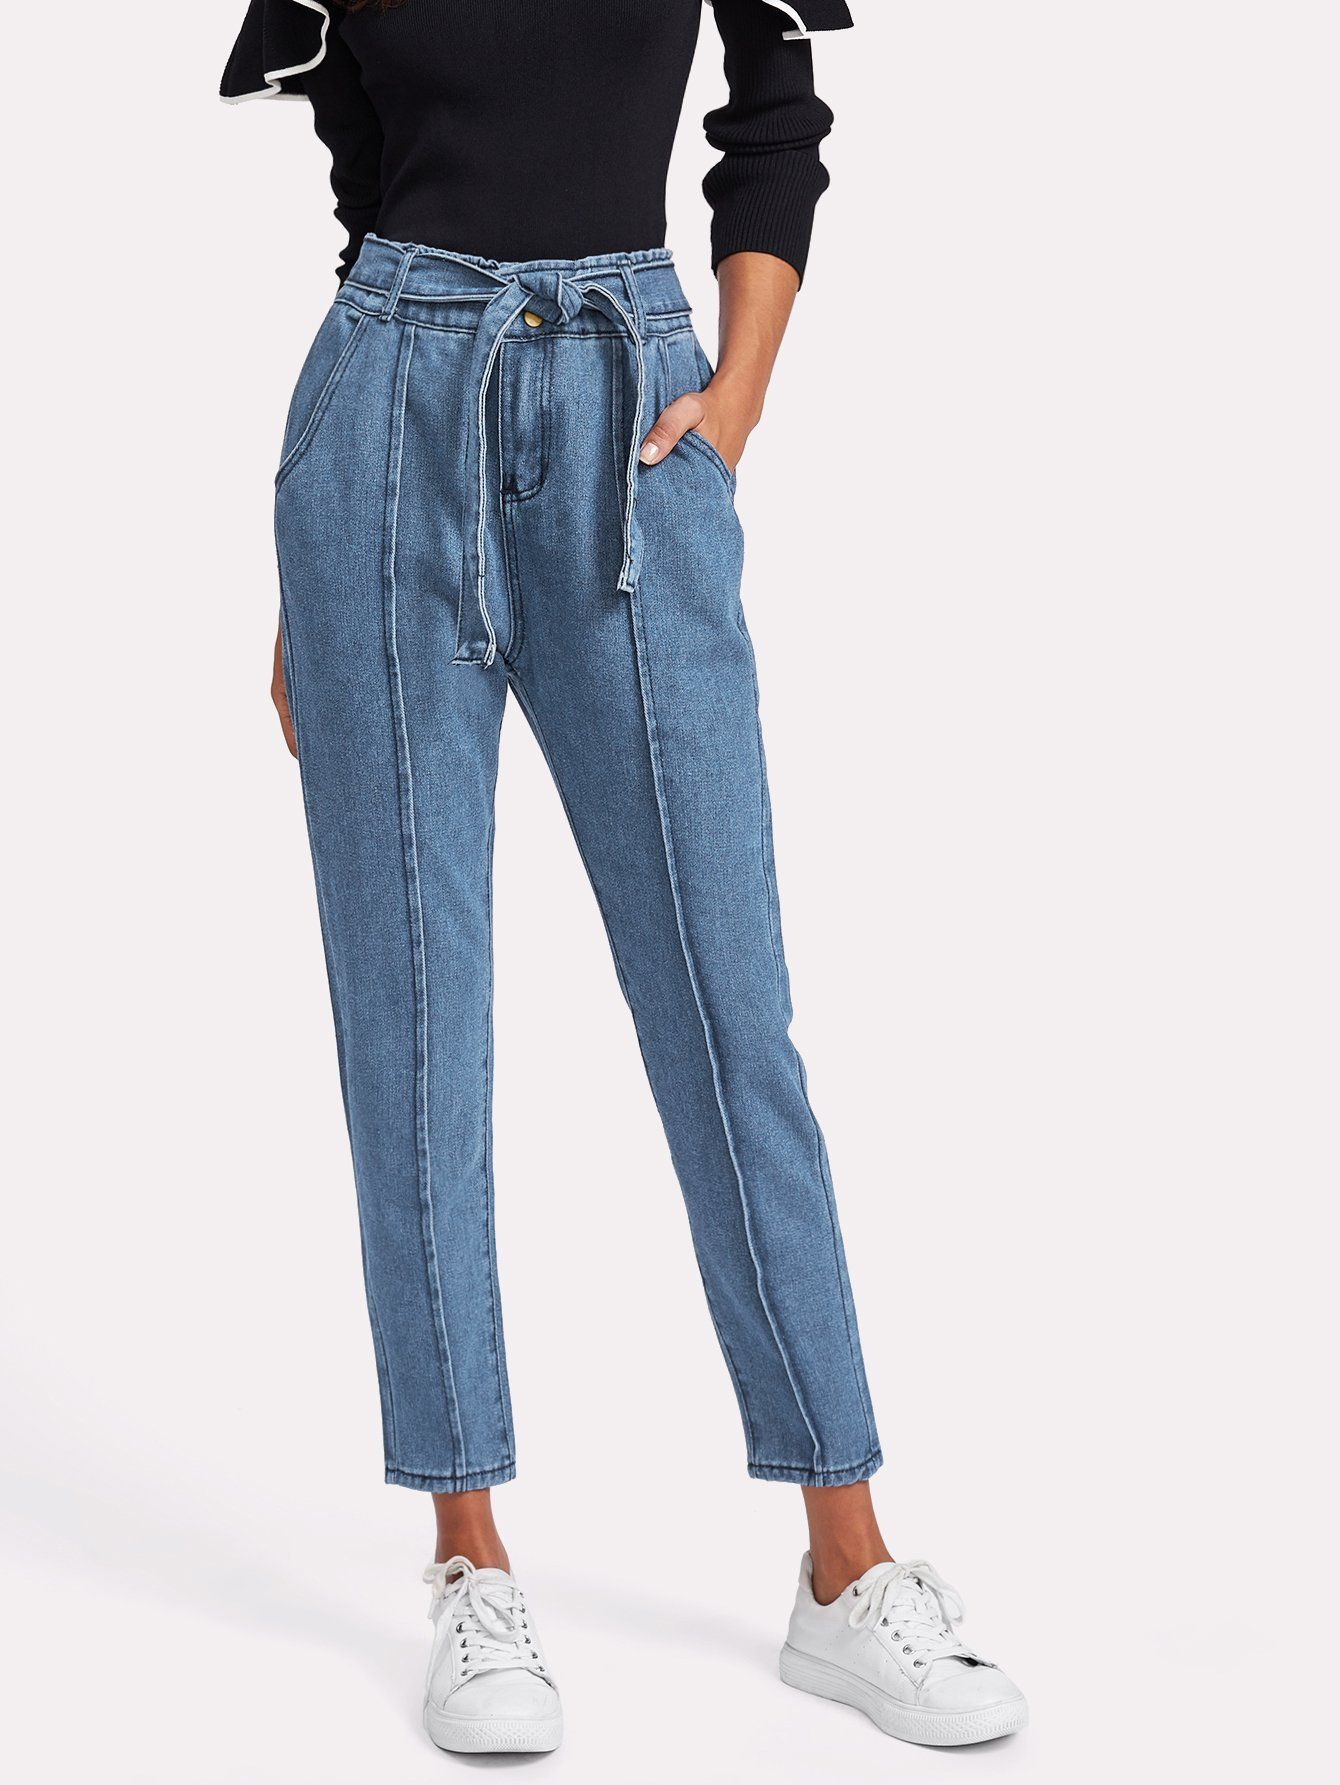 213ea8b8f9de Seam Detail Self Tie Jeans   Crafts and Stuff   Jeans, Denim, Denim ...